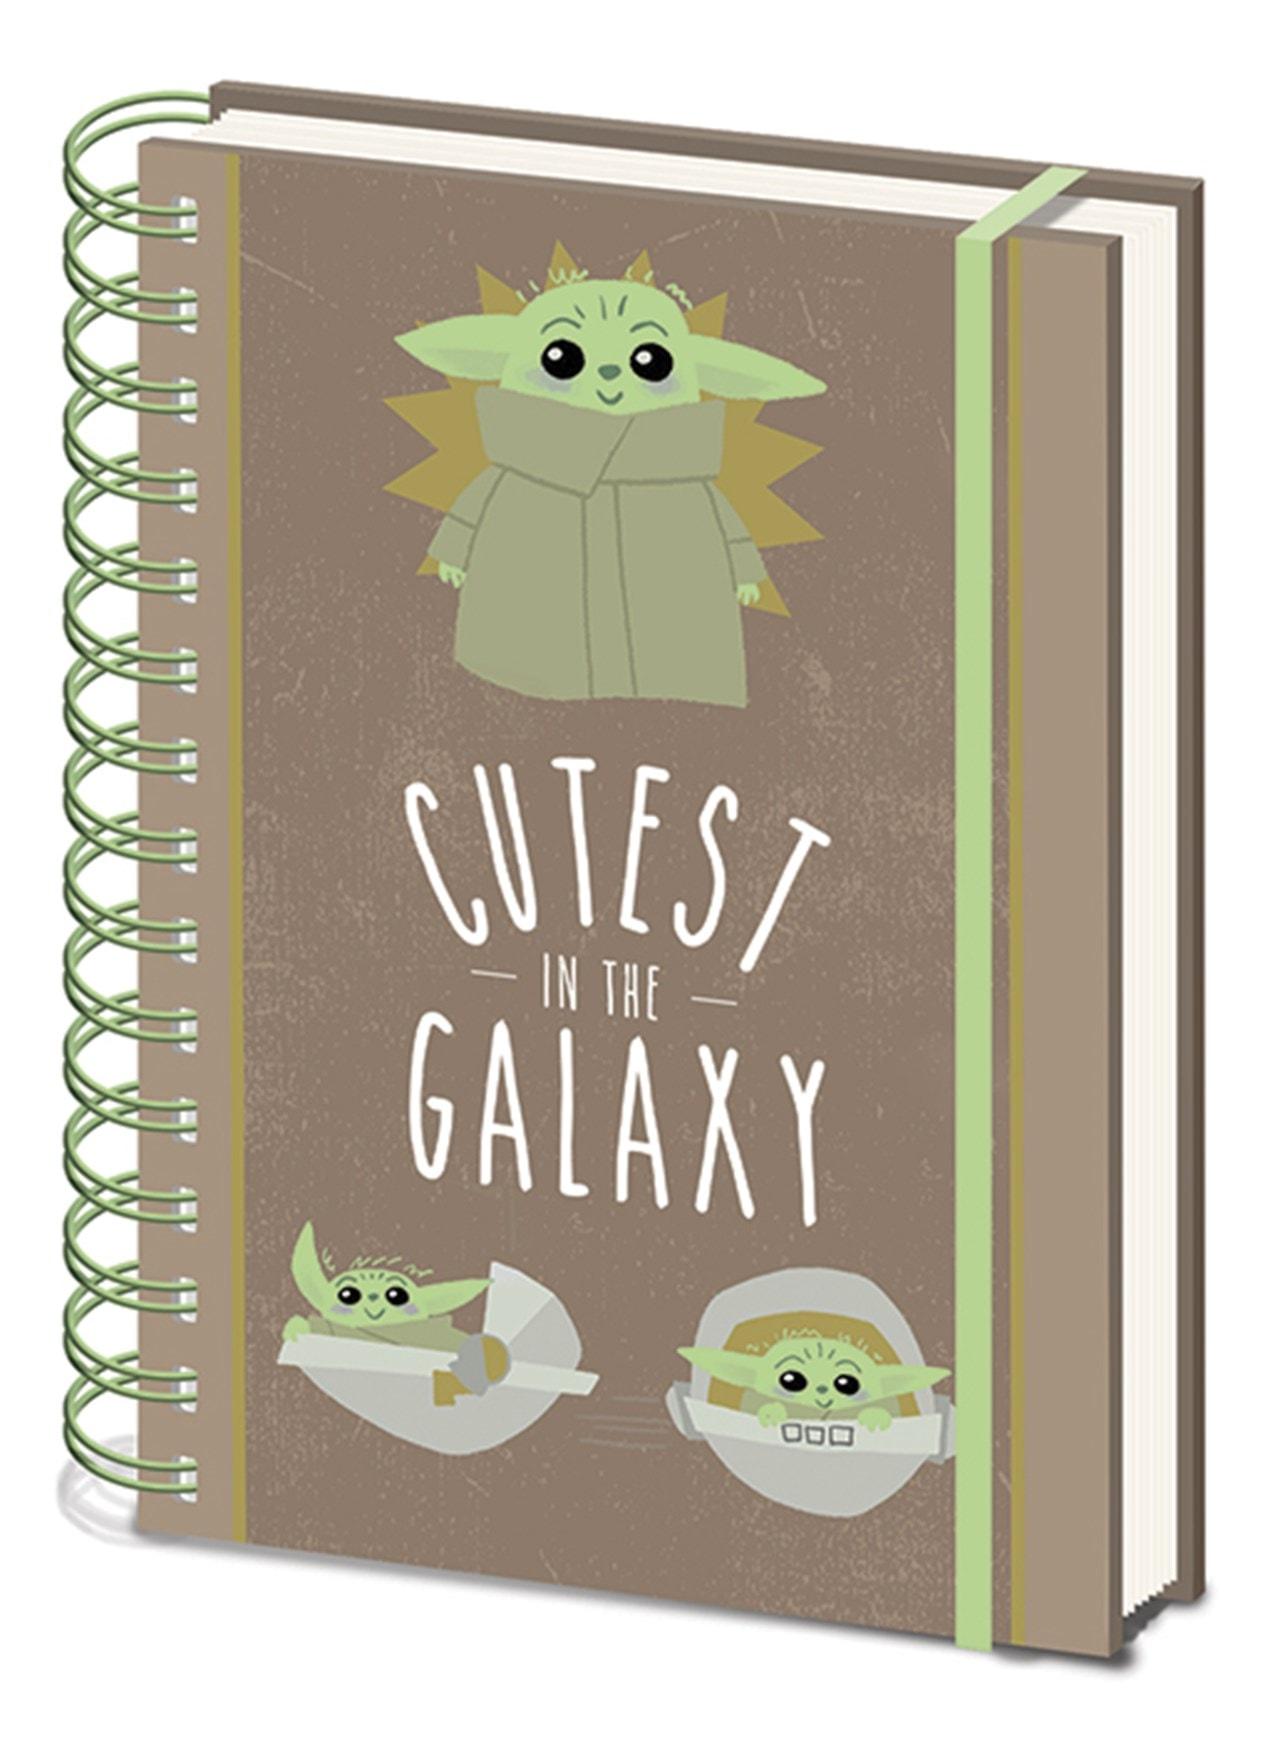 Star Wars: The Mandalorian: Cutest In The Galaxy: A5 Wiro Notebook - 1